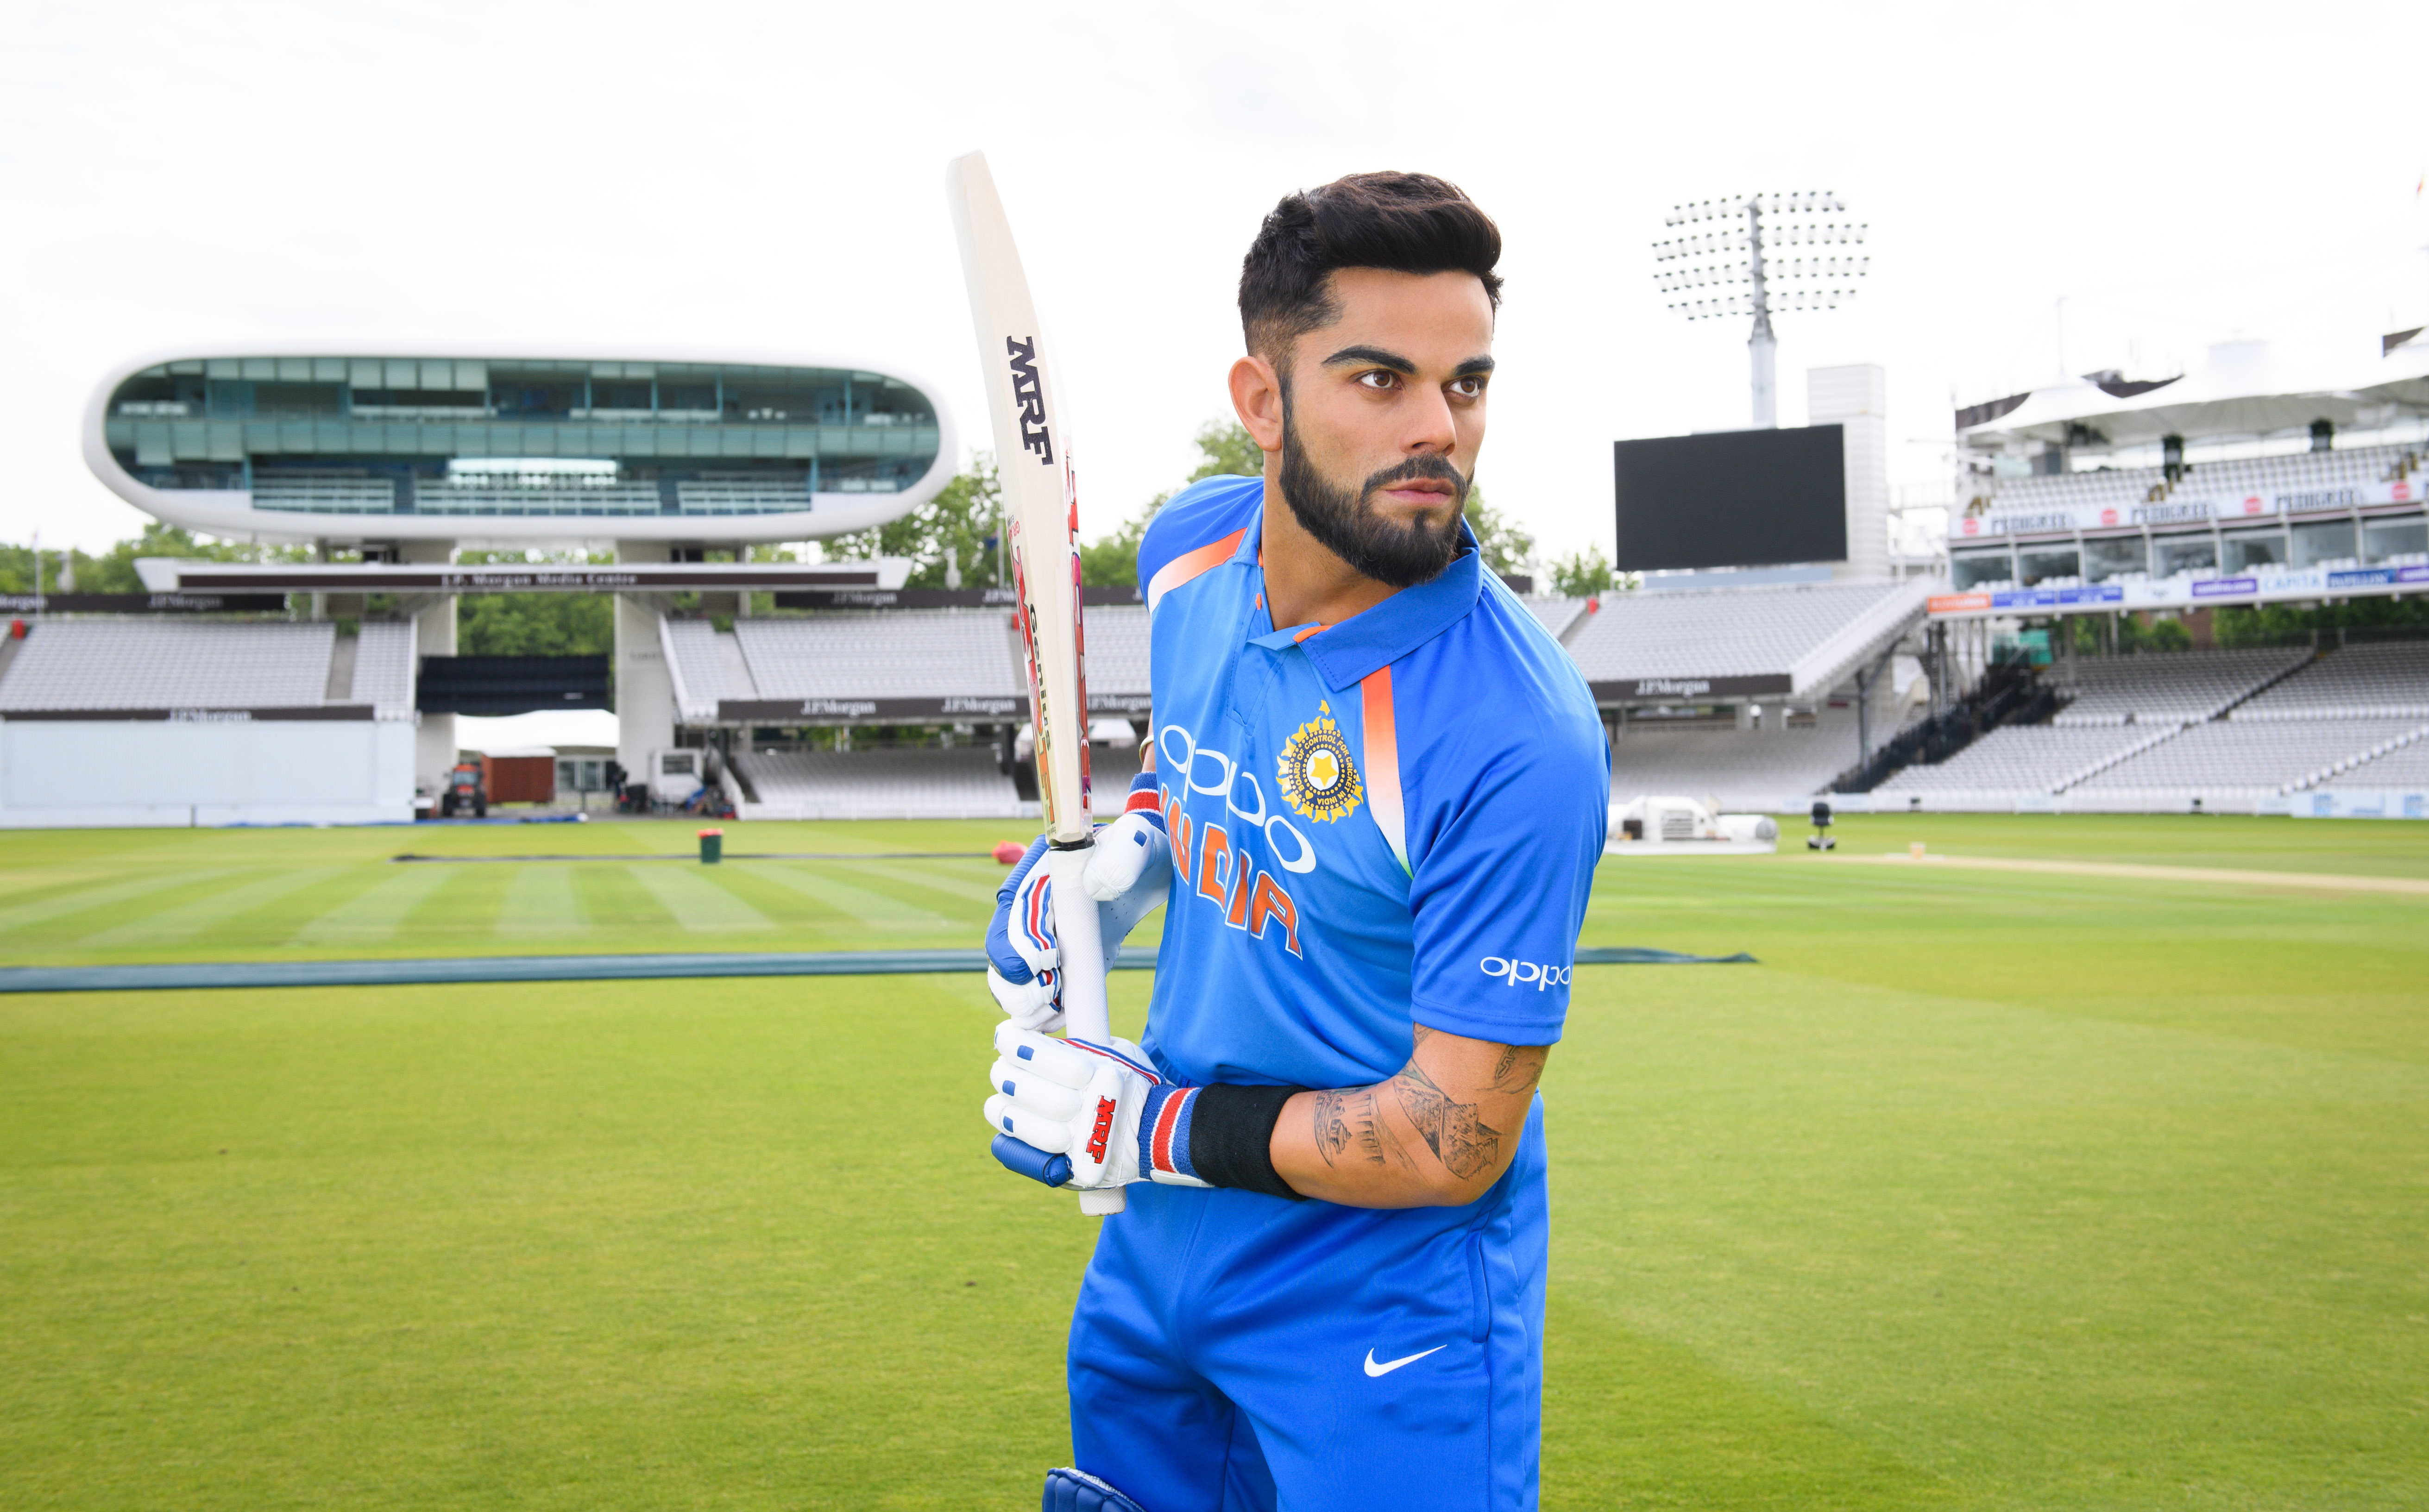 Cricket player Virat Kohli dressed in blue Indian cricket uniform